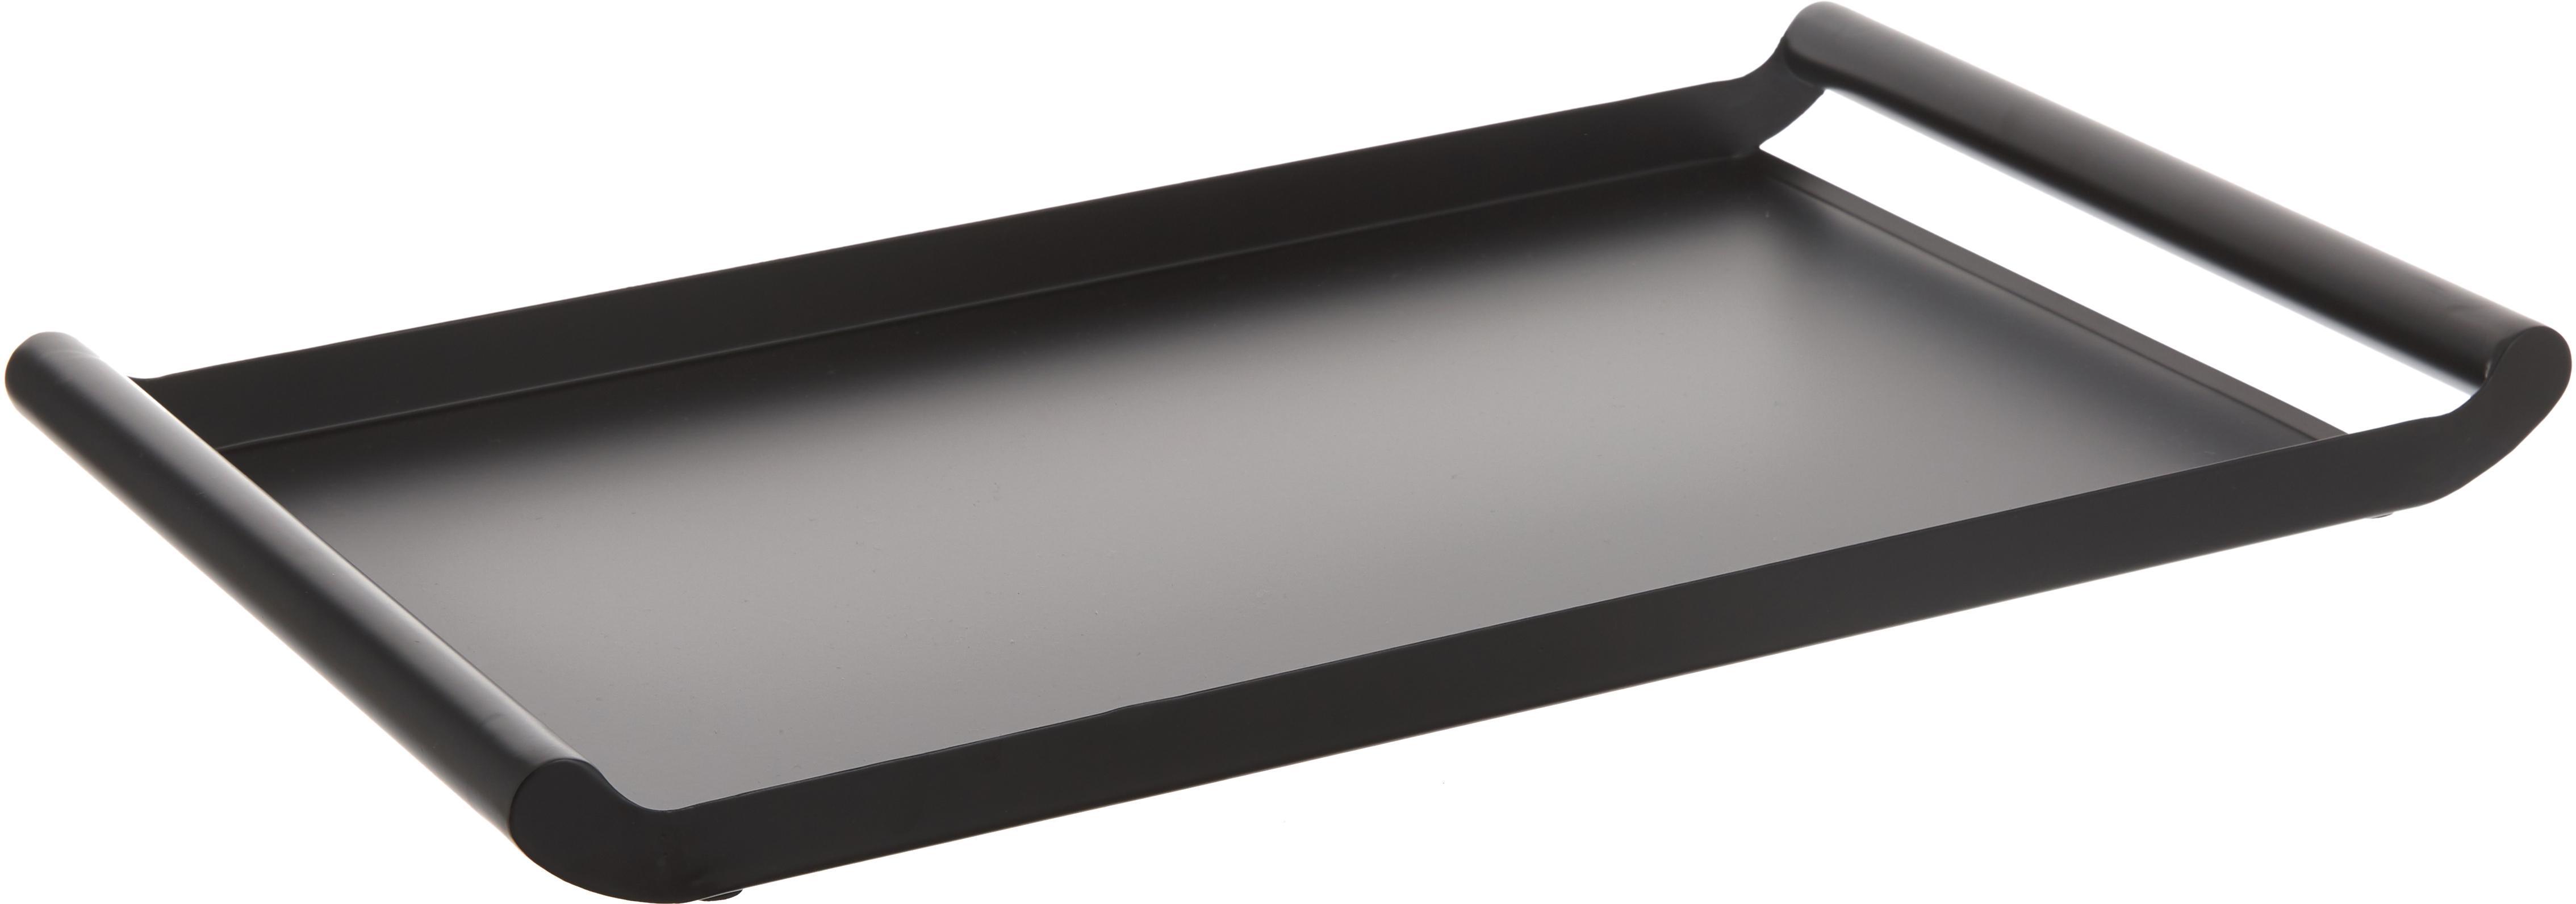 Bandeja Charlie, Metal, recubierto, Negro, An 50 x F 30 cm